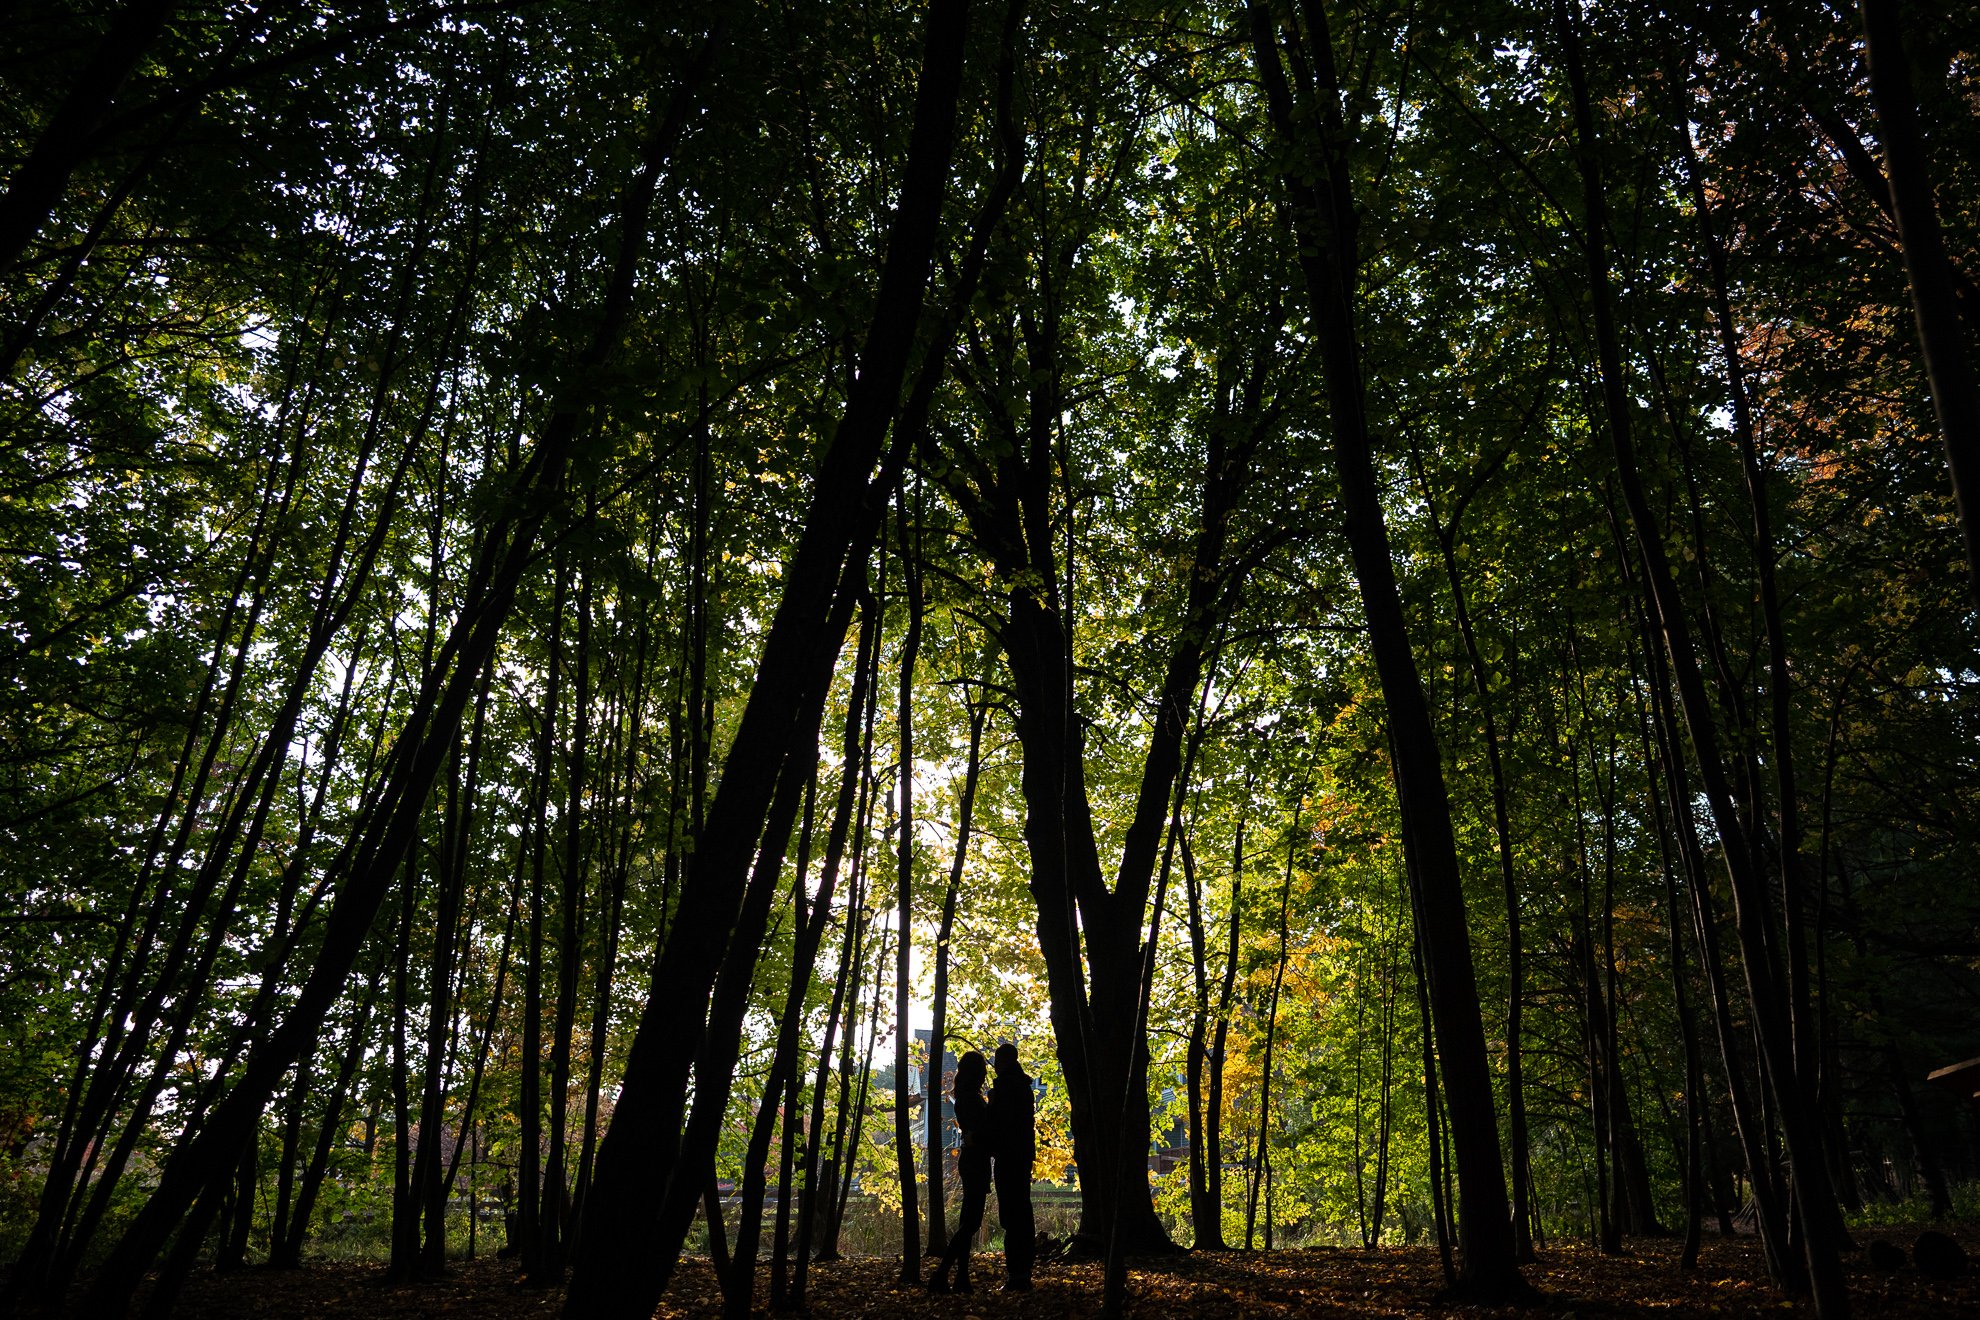 Couples Silhouette Aldo Leopold Woods